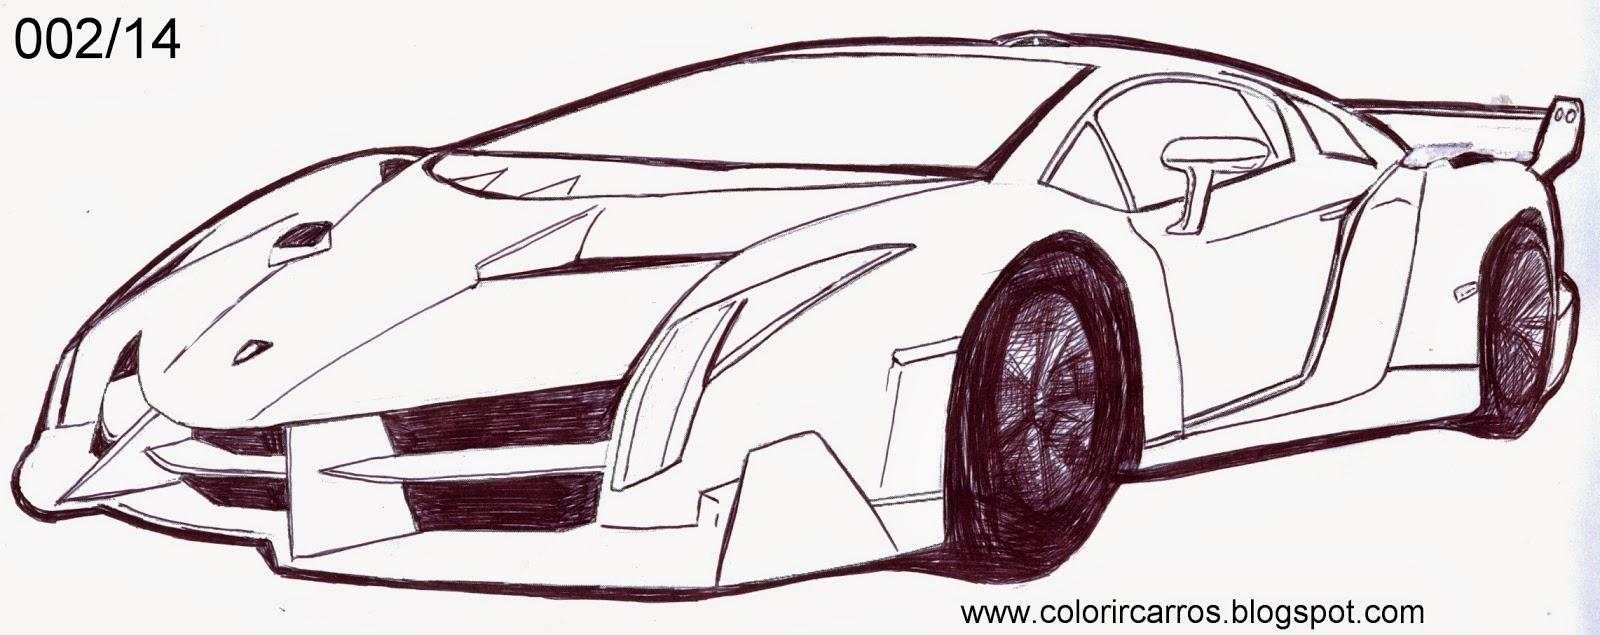 de professor adilson colorir carros